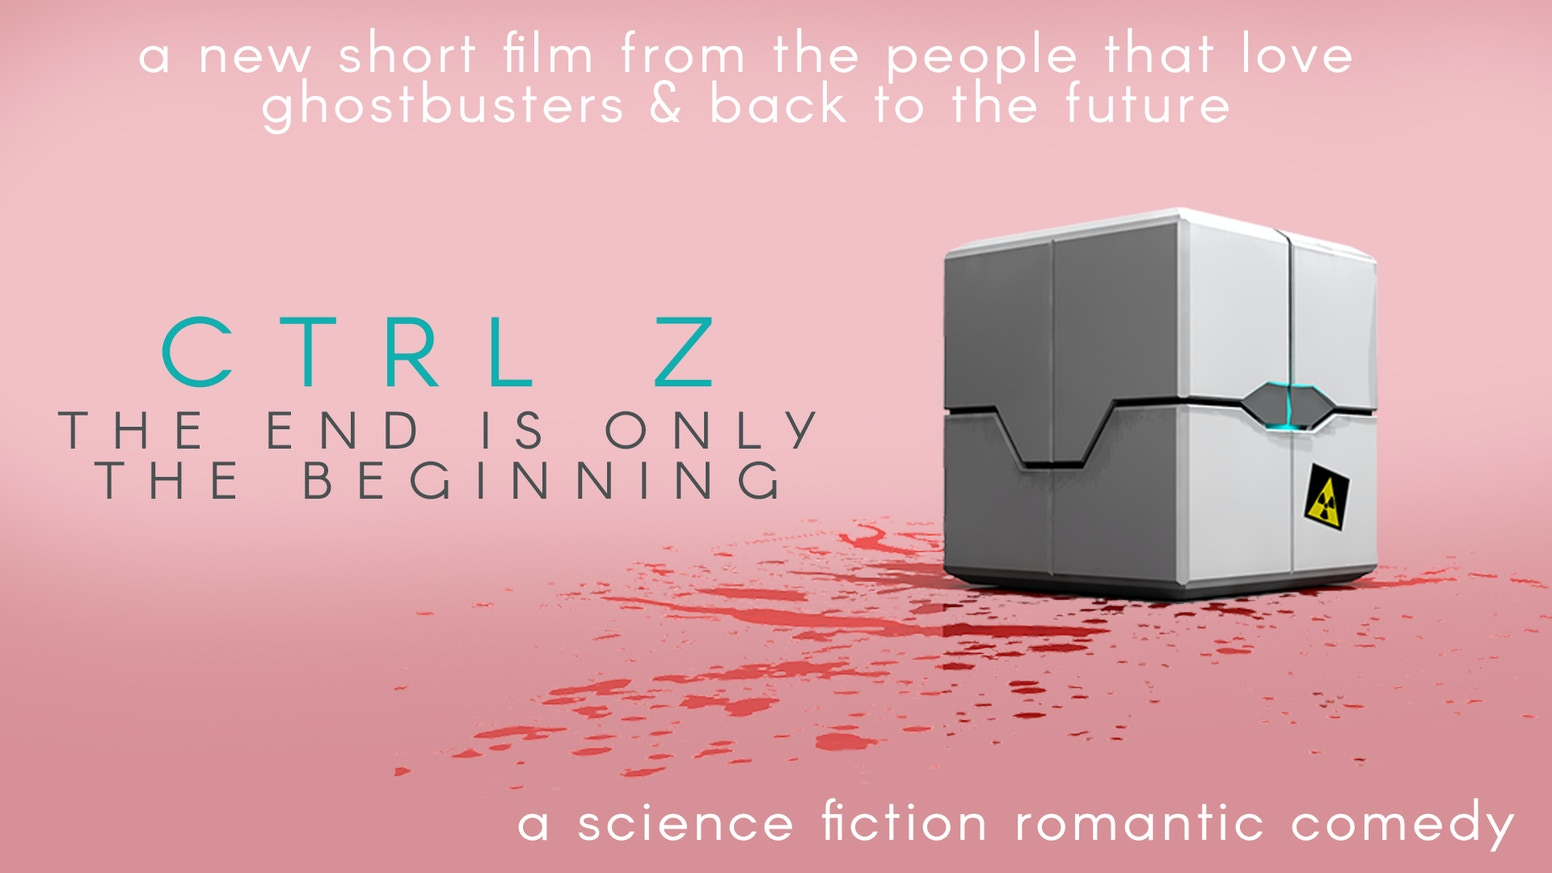 CTRL Z - A Science Fiction Romantic Comedy by James Kennedy